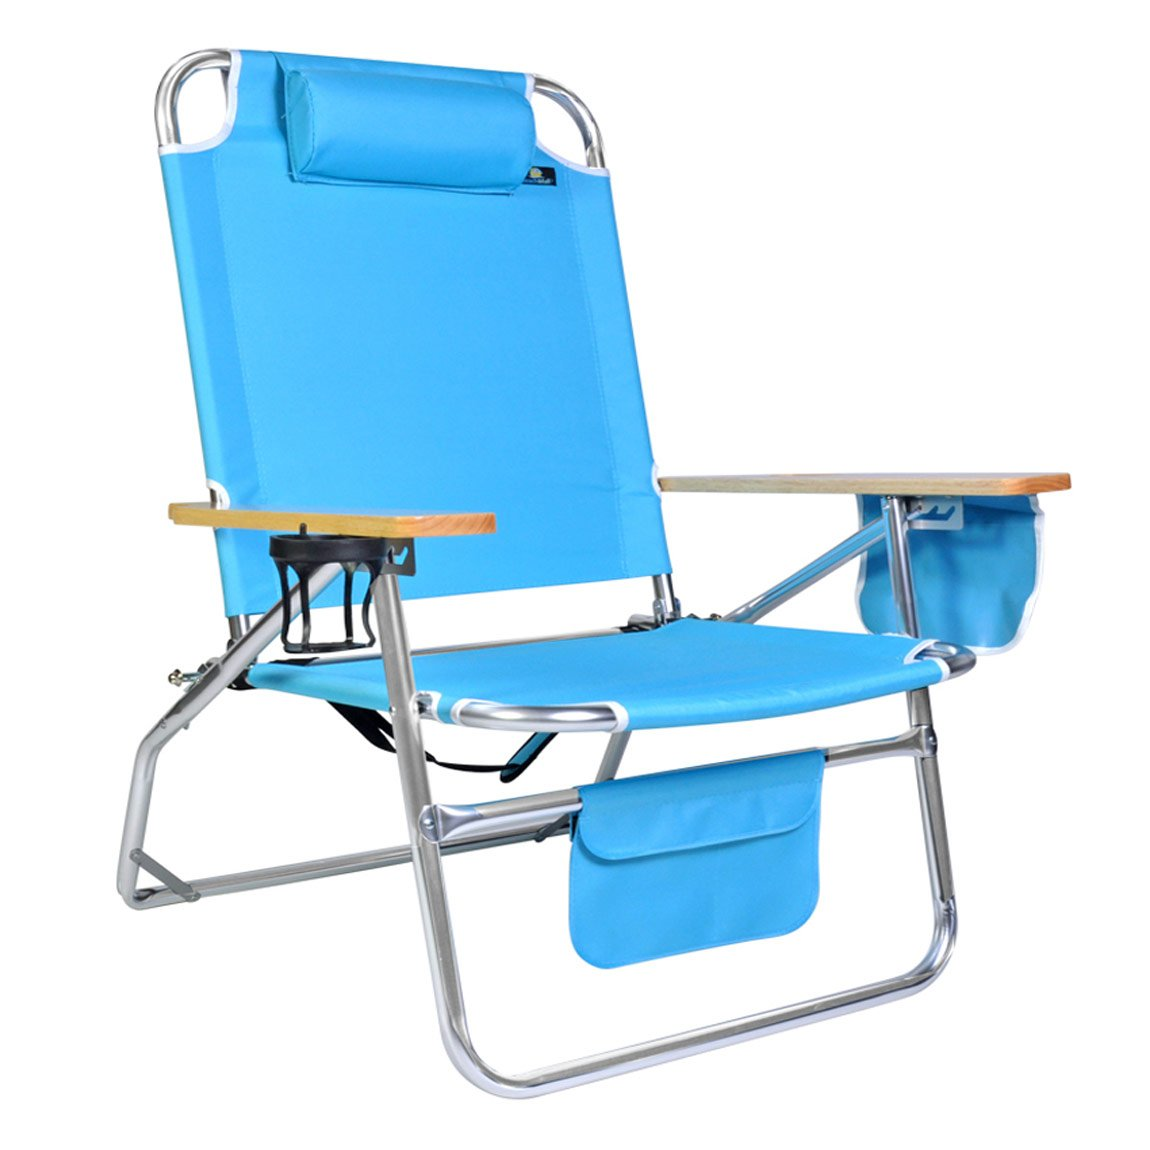 Amazon.com : Big Jumbo Heavy Duty 500 lbs XL Aluminum Beach Chair ...